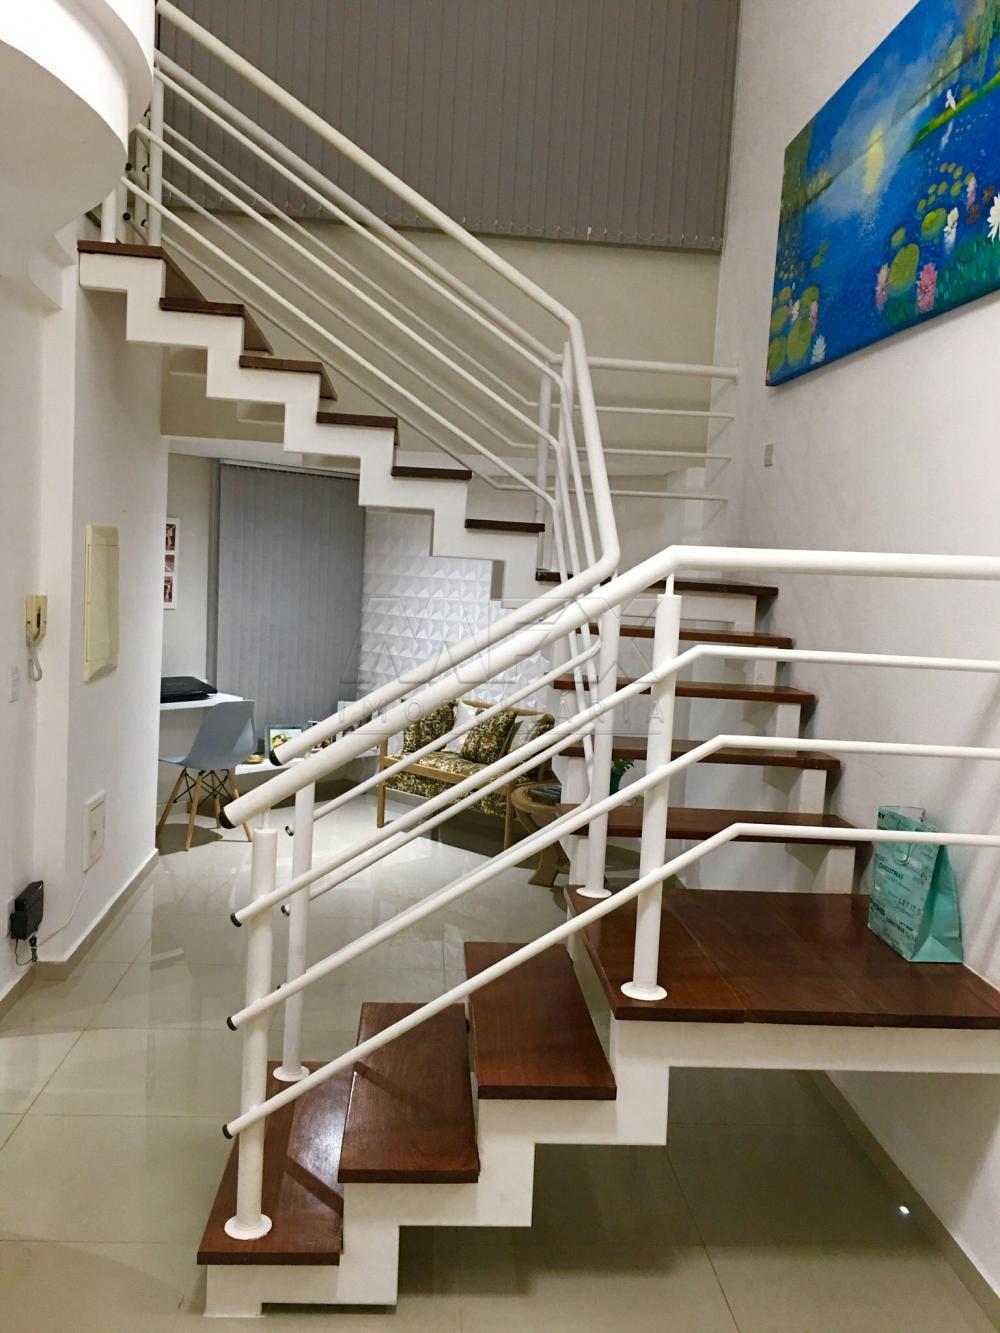 Comprar Apartamento / Duplex em Bauru R$ 700.000,00 - Foto 7